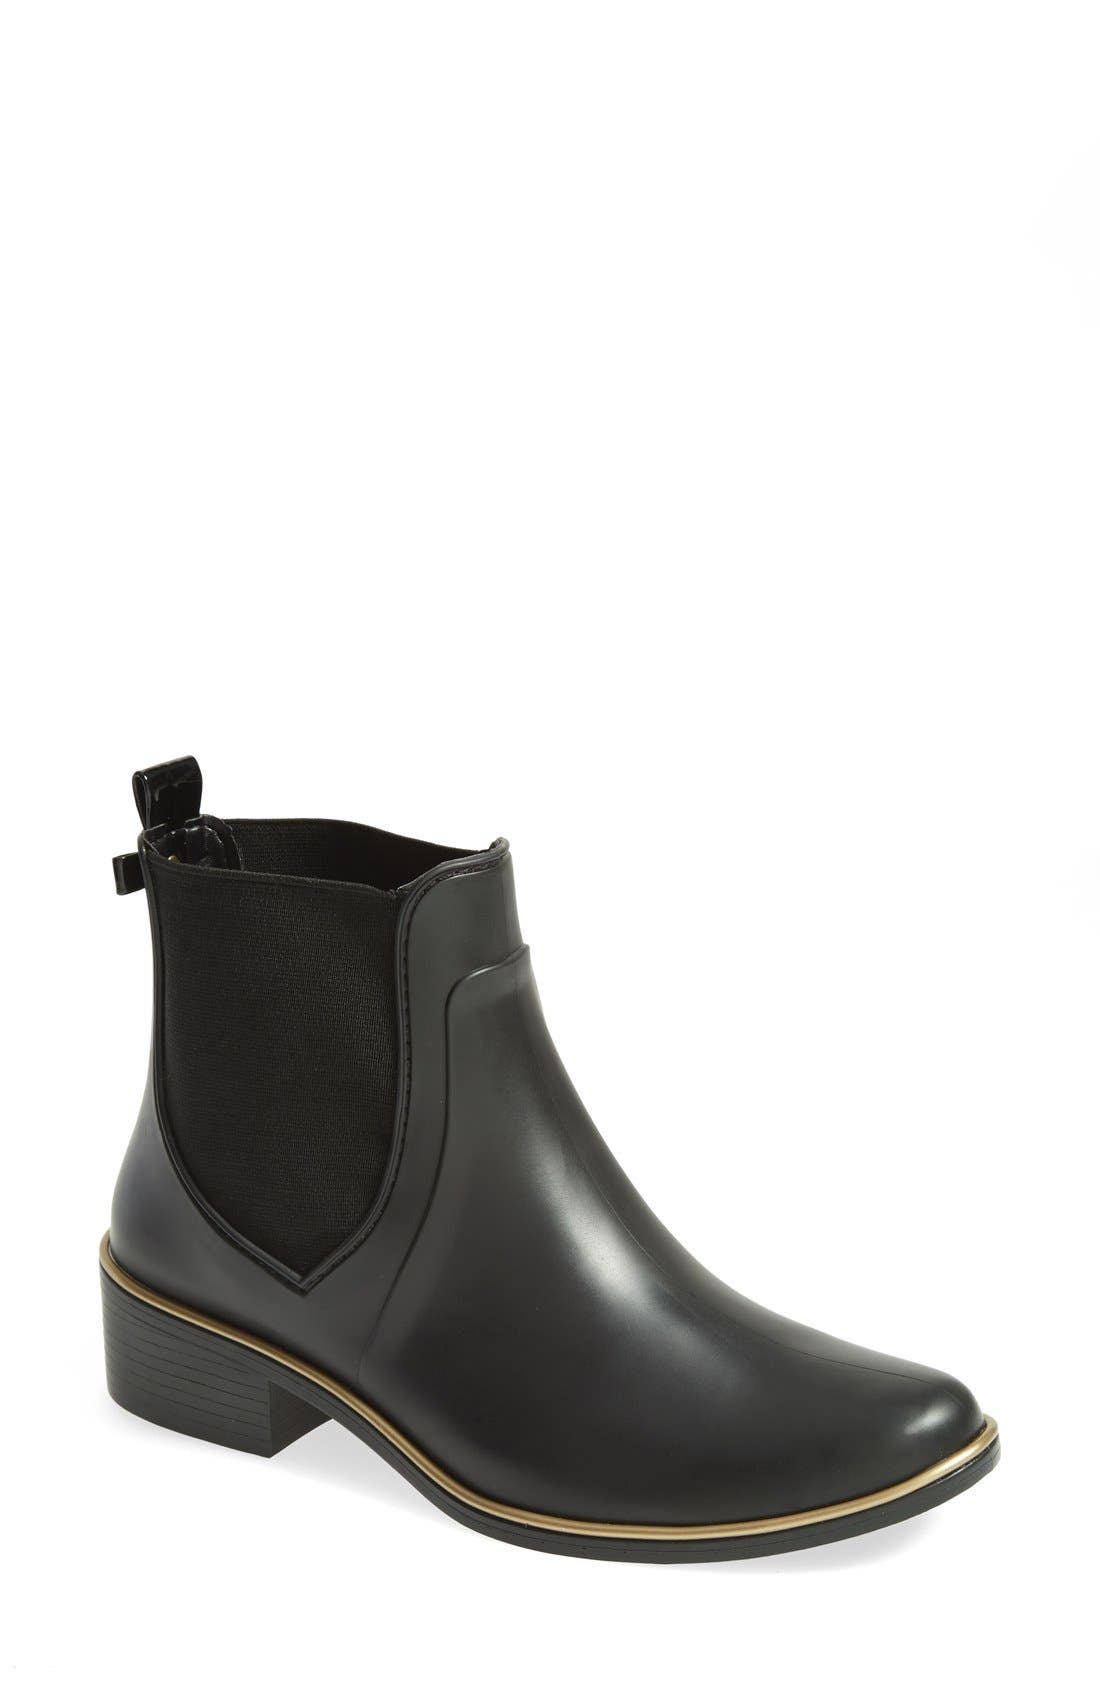 Alternate Image 1 Selected - kate spade new york 'sedgewick' rubber rain boot (Women)